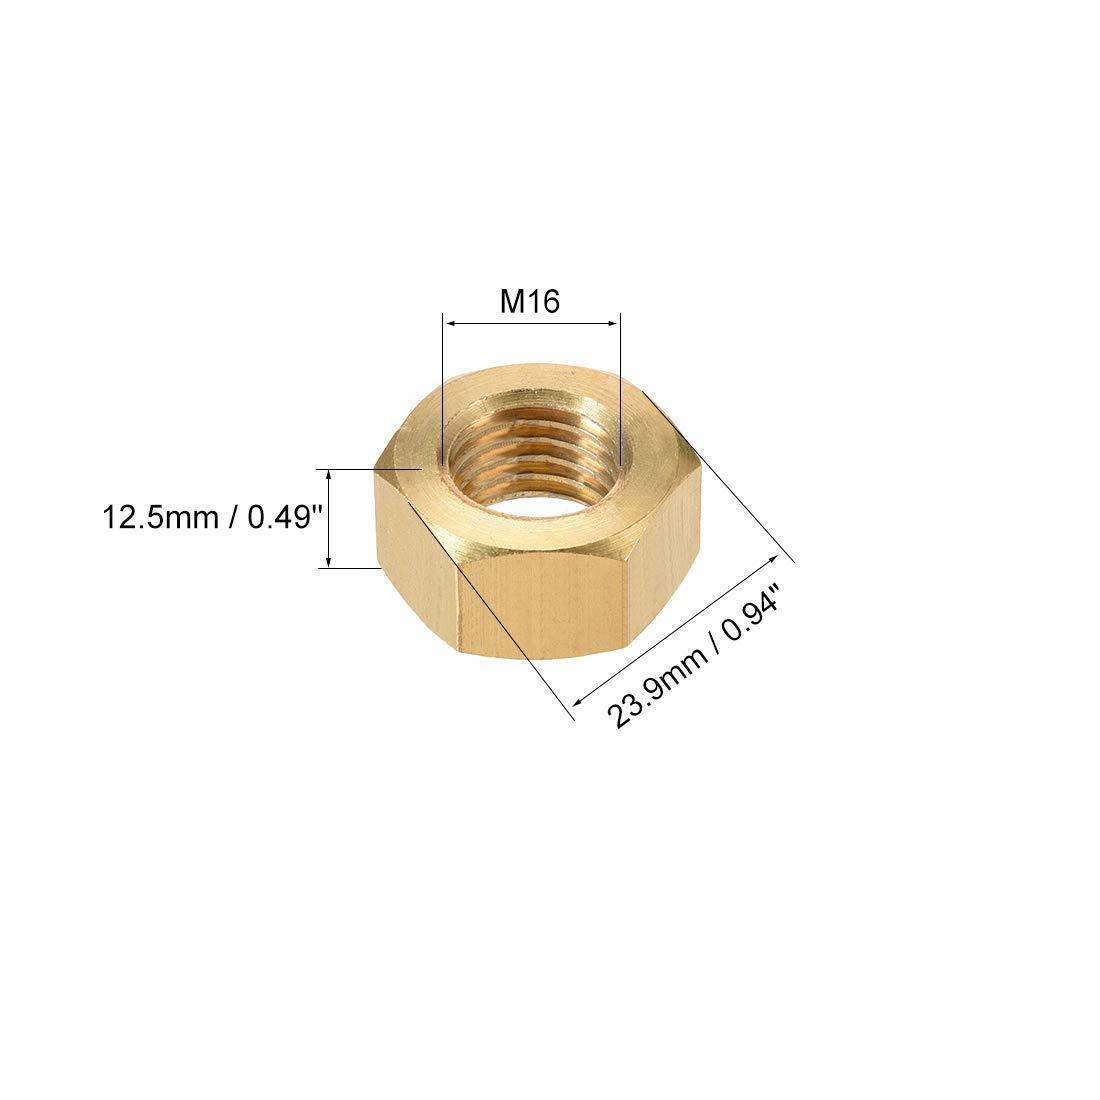 M16x2mm Metric Thick Thread Hexagon nut Pack of 4 Hexagon Nuts Brass